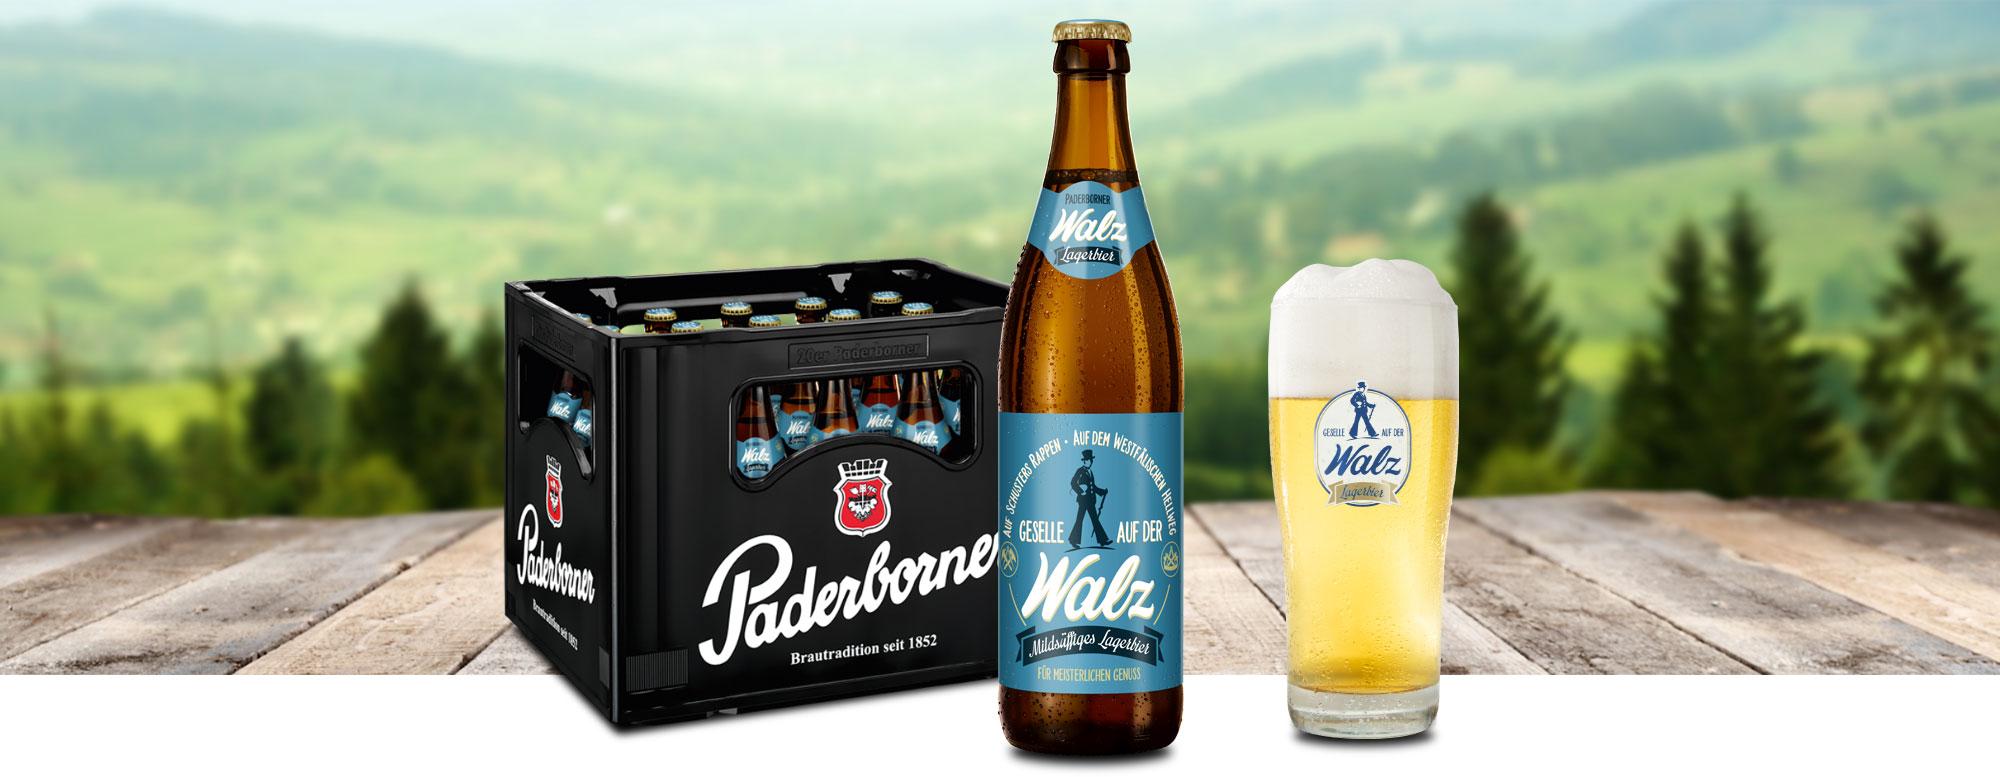 Header Paderborner Walz